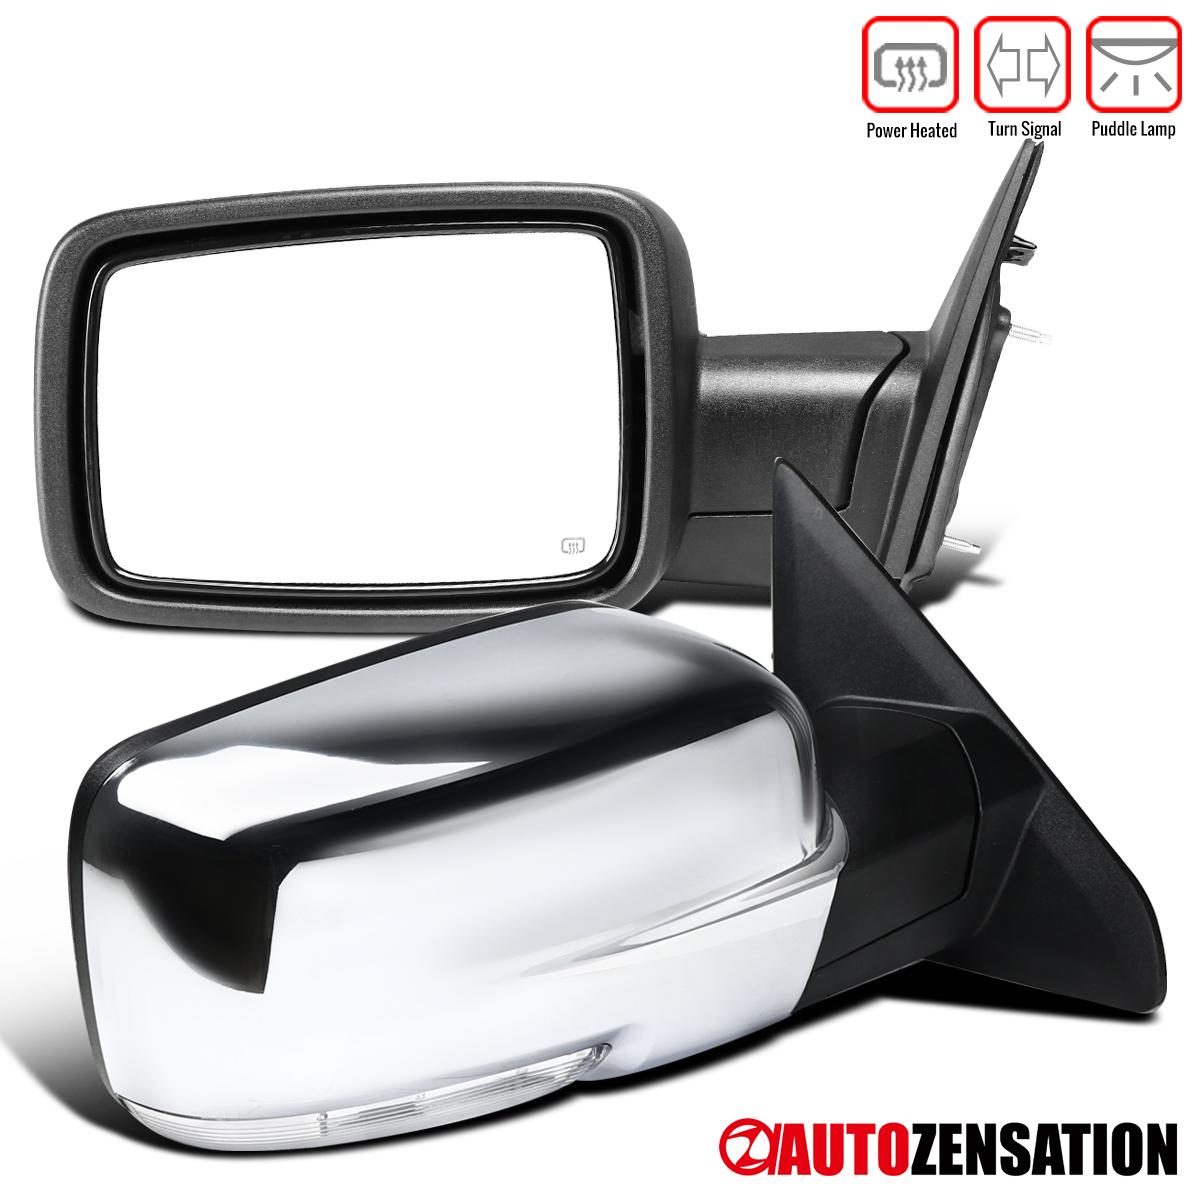 New Left//Driver Smoked Turn Signal Power Heated Mirror For Ram Trucks 2009-2012